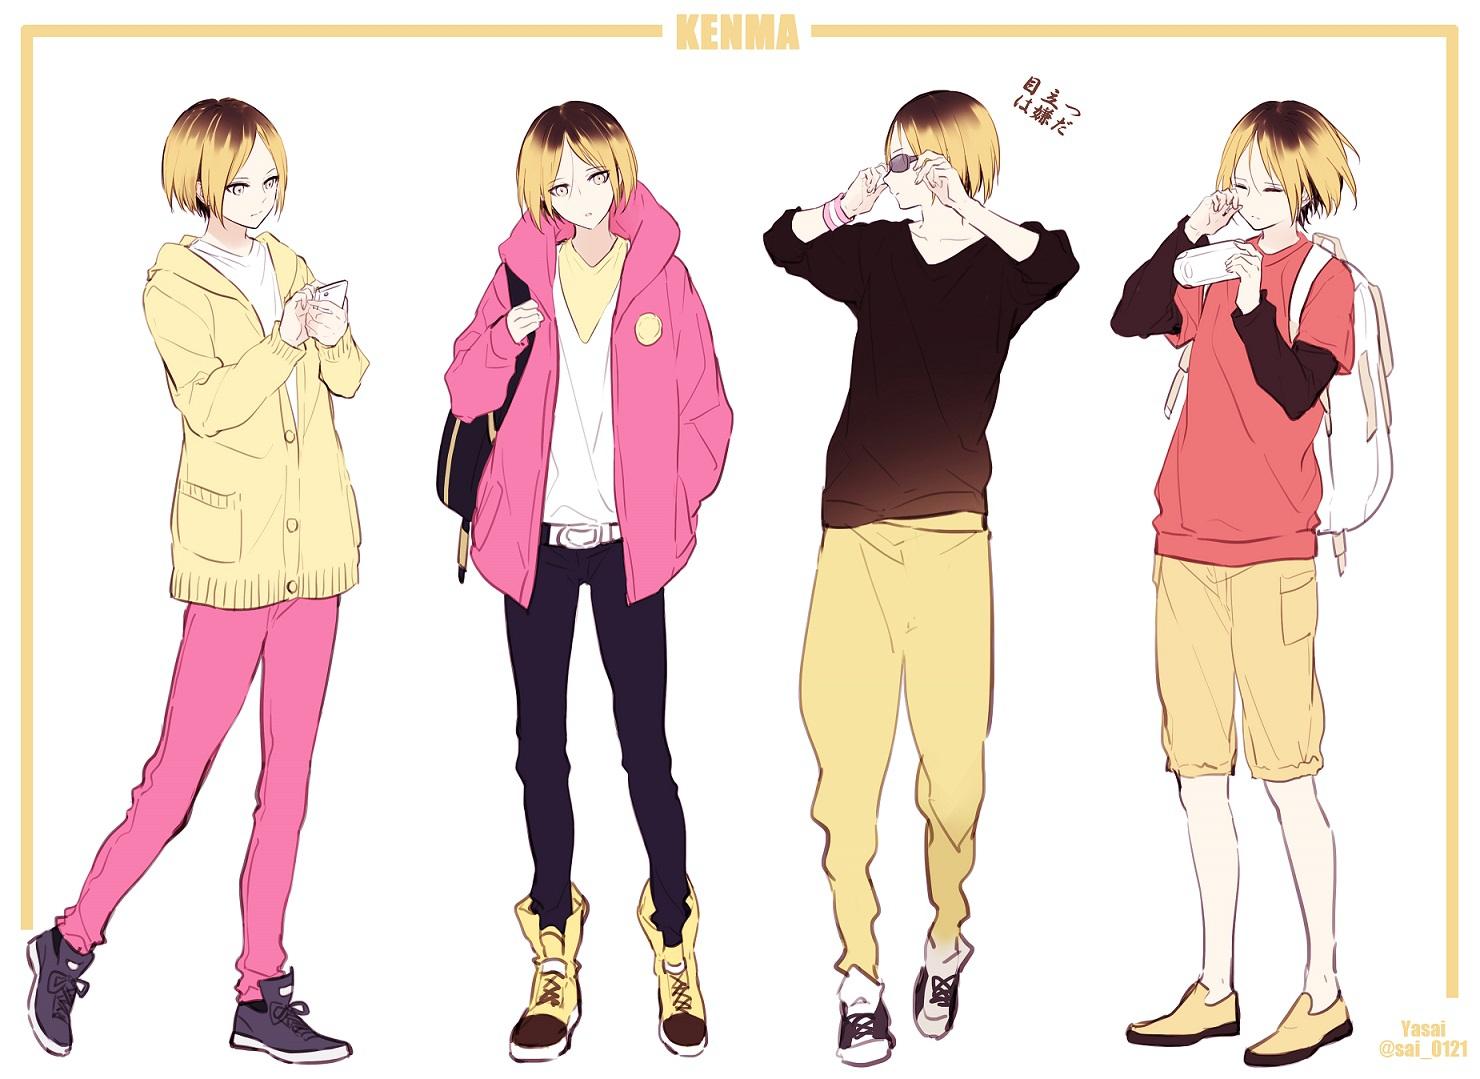 Kozume Kenma Haikyuu Zerochan Anime Image Board